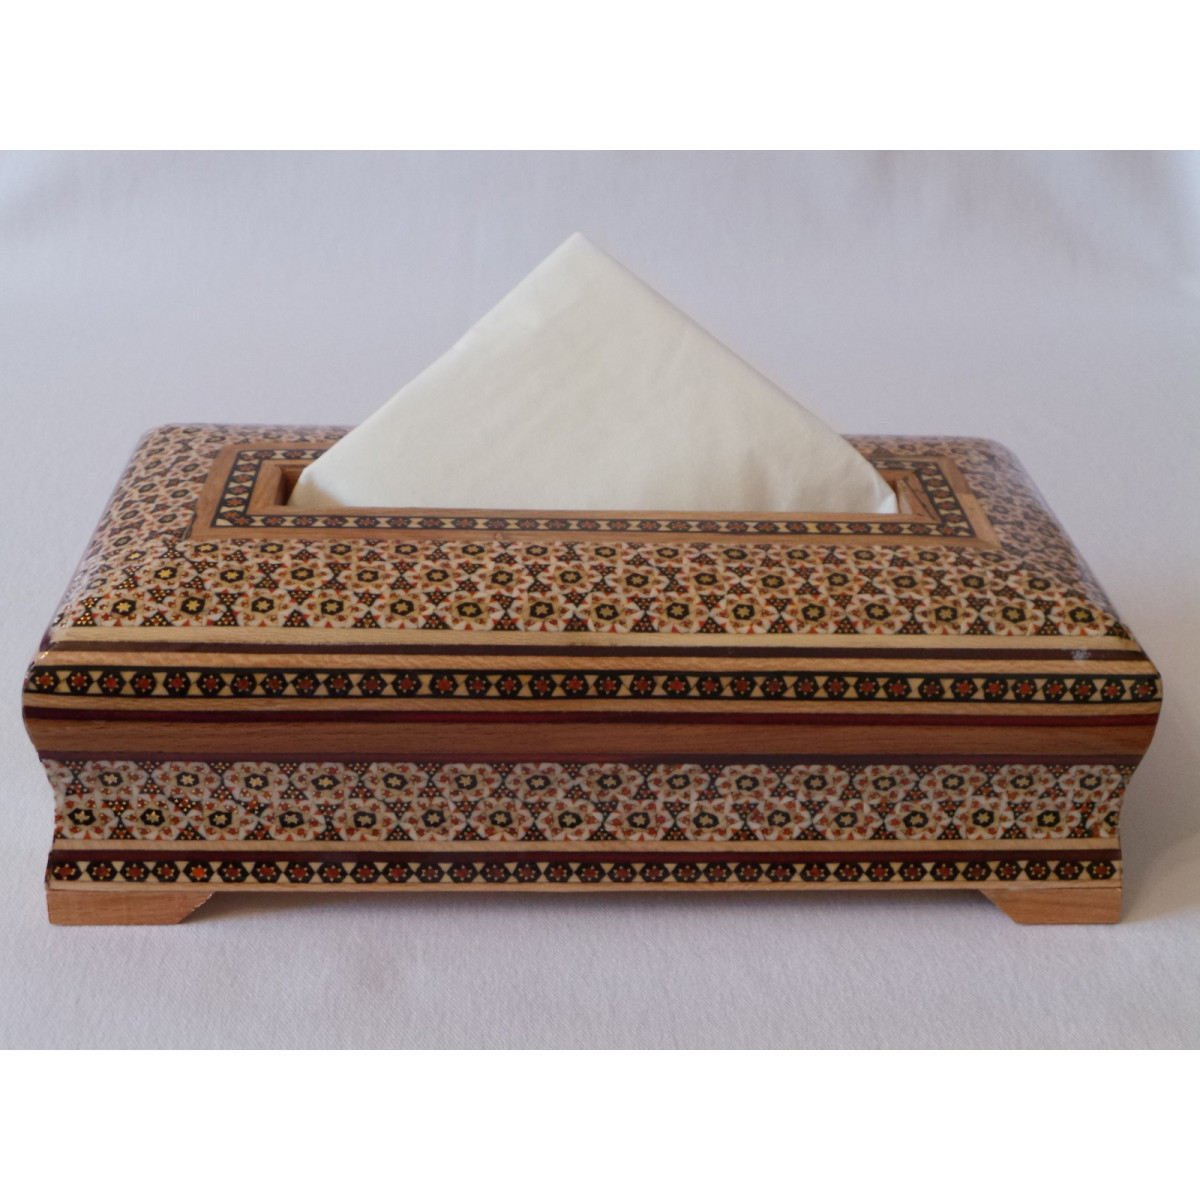 Khatam on Wood Tissue Box - HKH2046-Persian Handicrafts